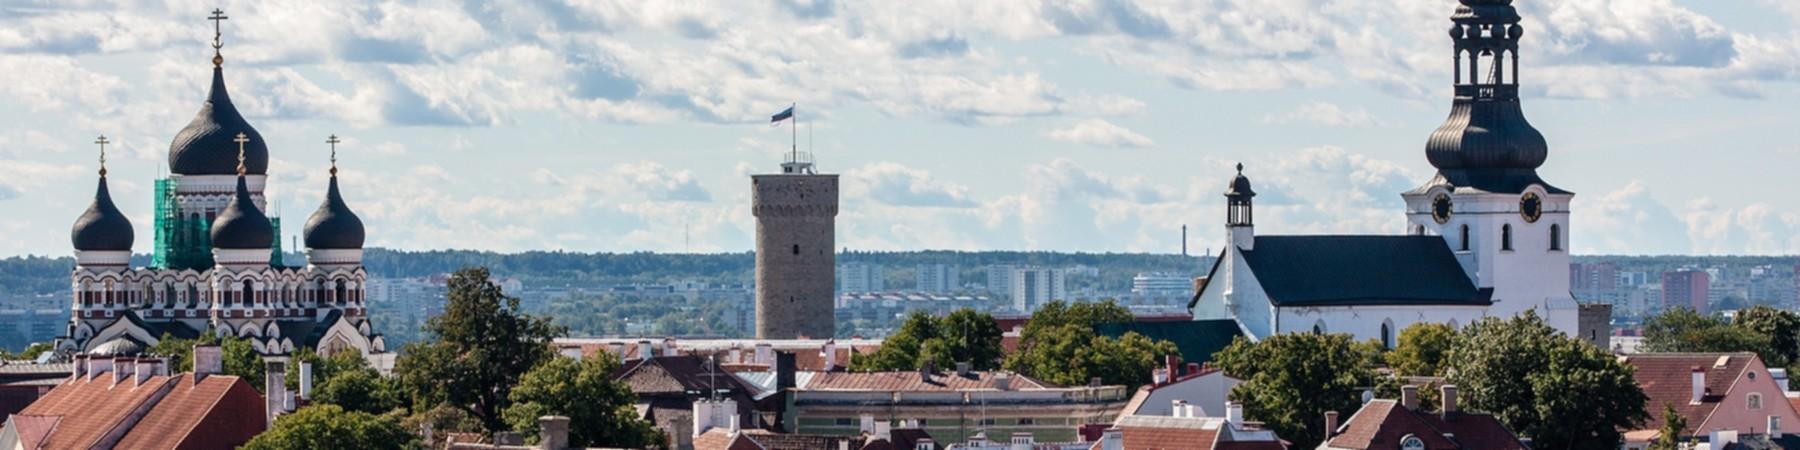 Tallinn Banner.jpg